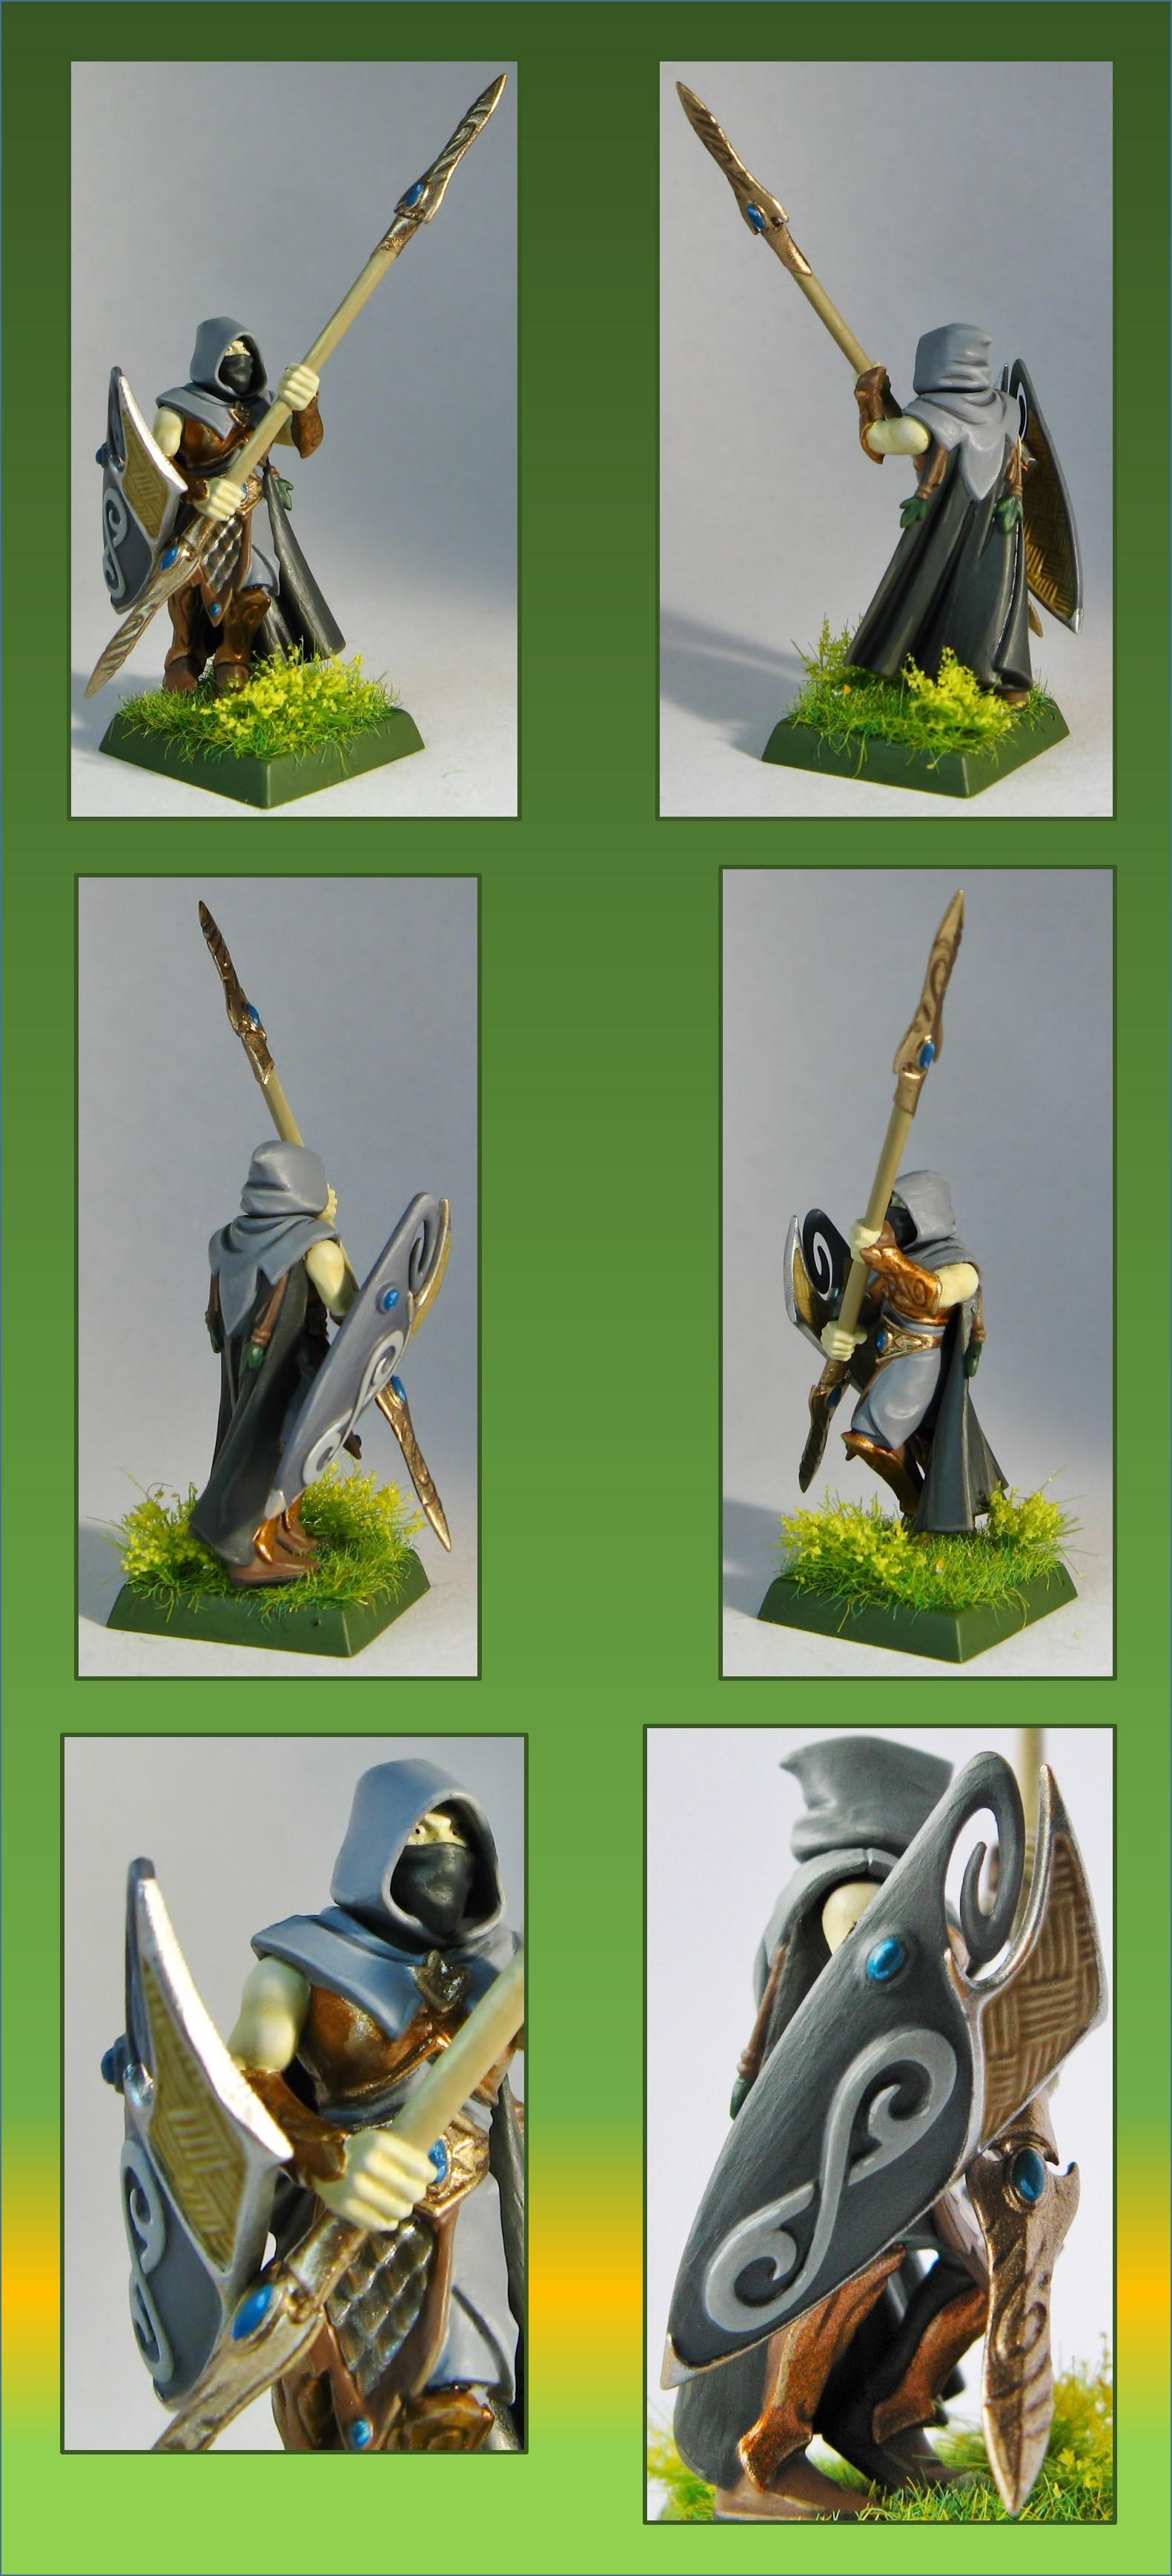 Cloak, Warhammer Fantasy, Wfb, Wood Elves